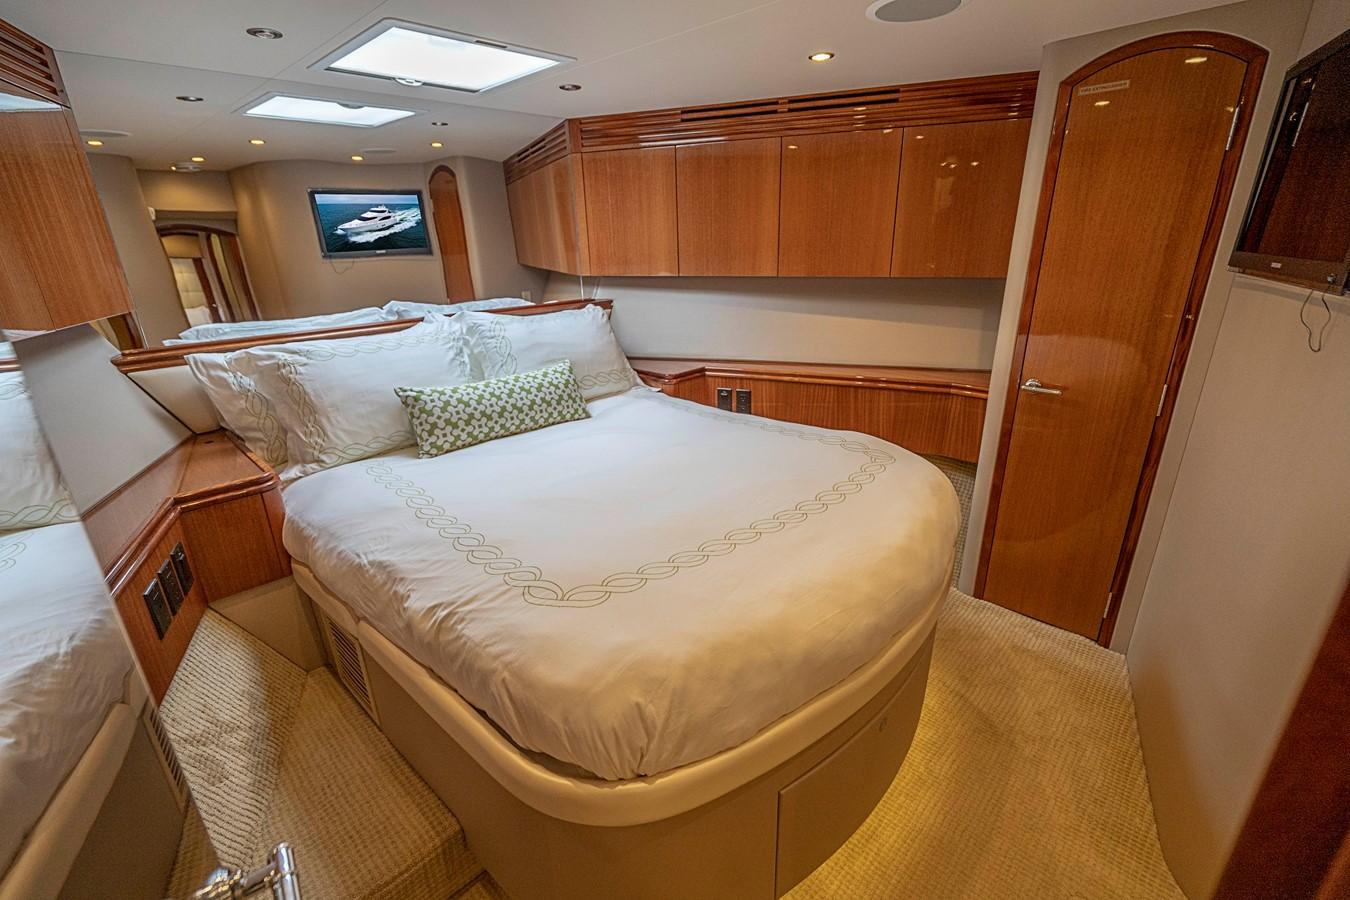 2011 HATTERAS Enclosed Bridge Motor Yacht 2679247